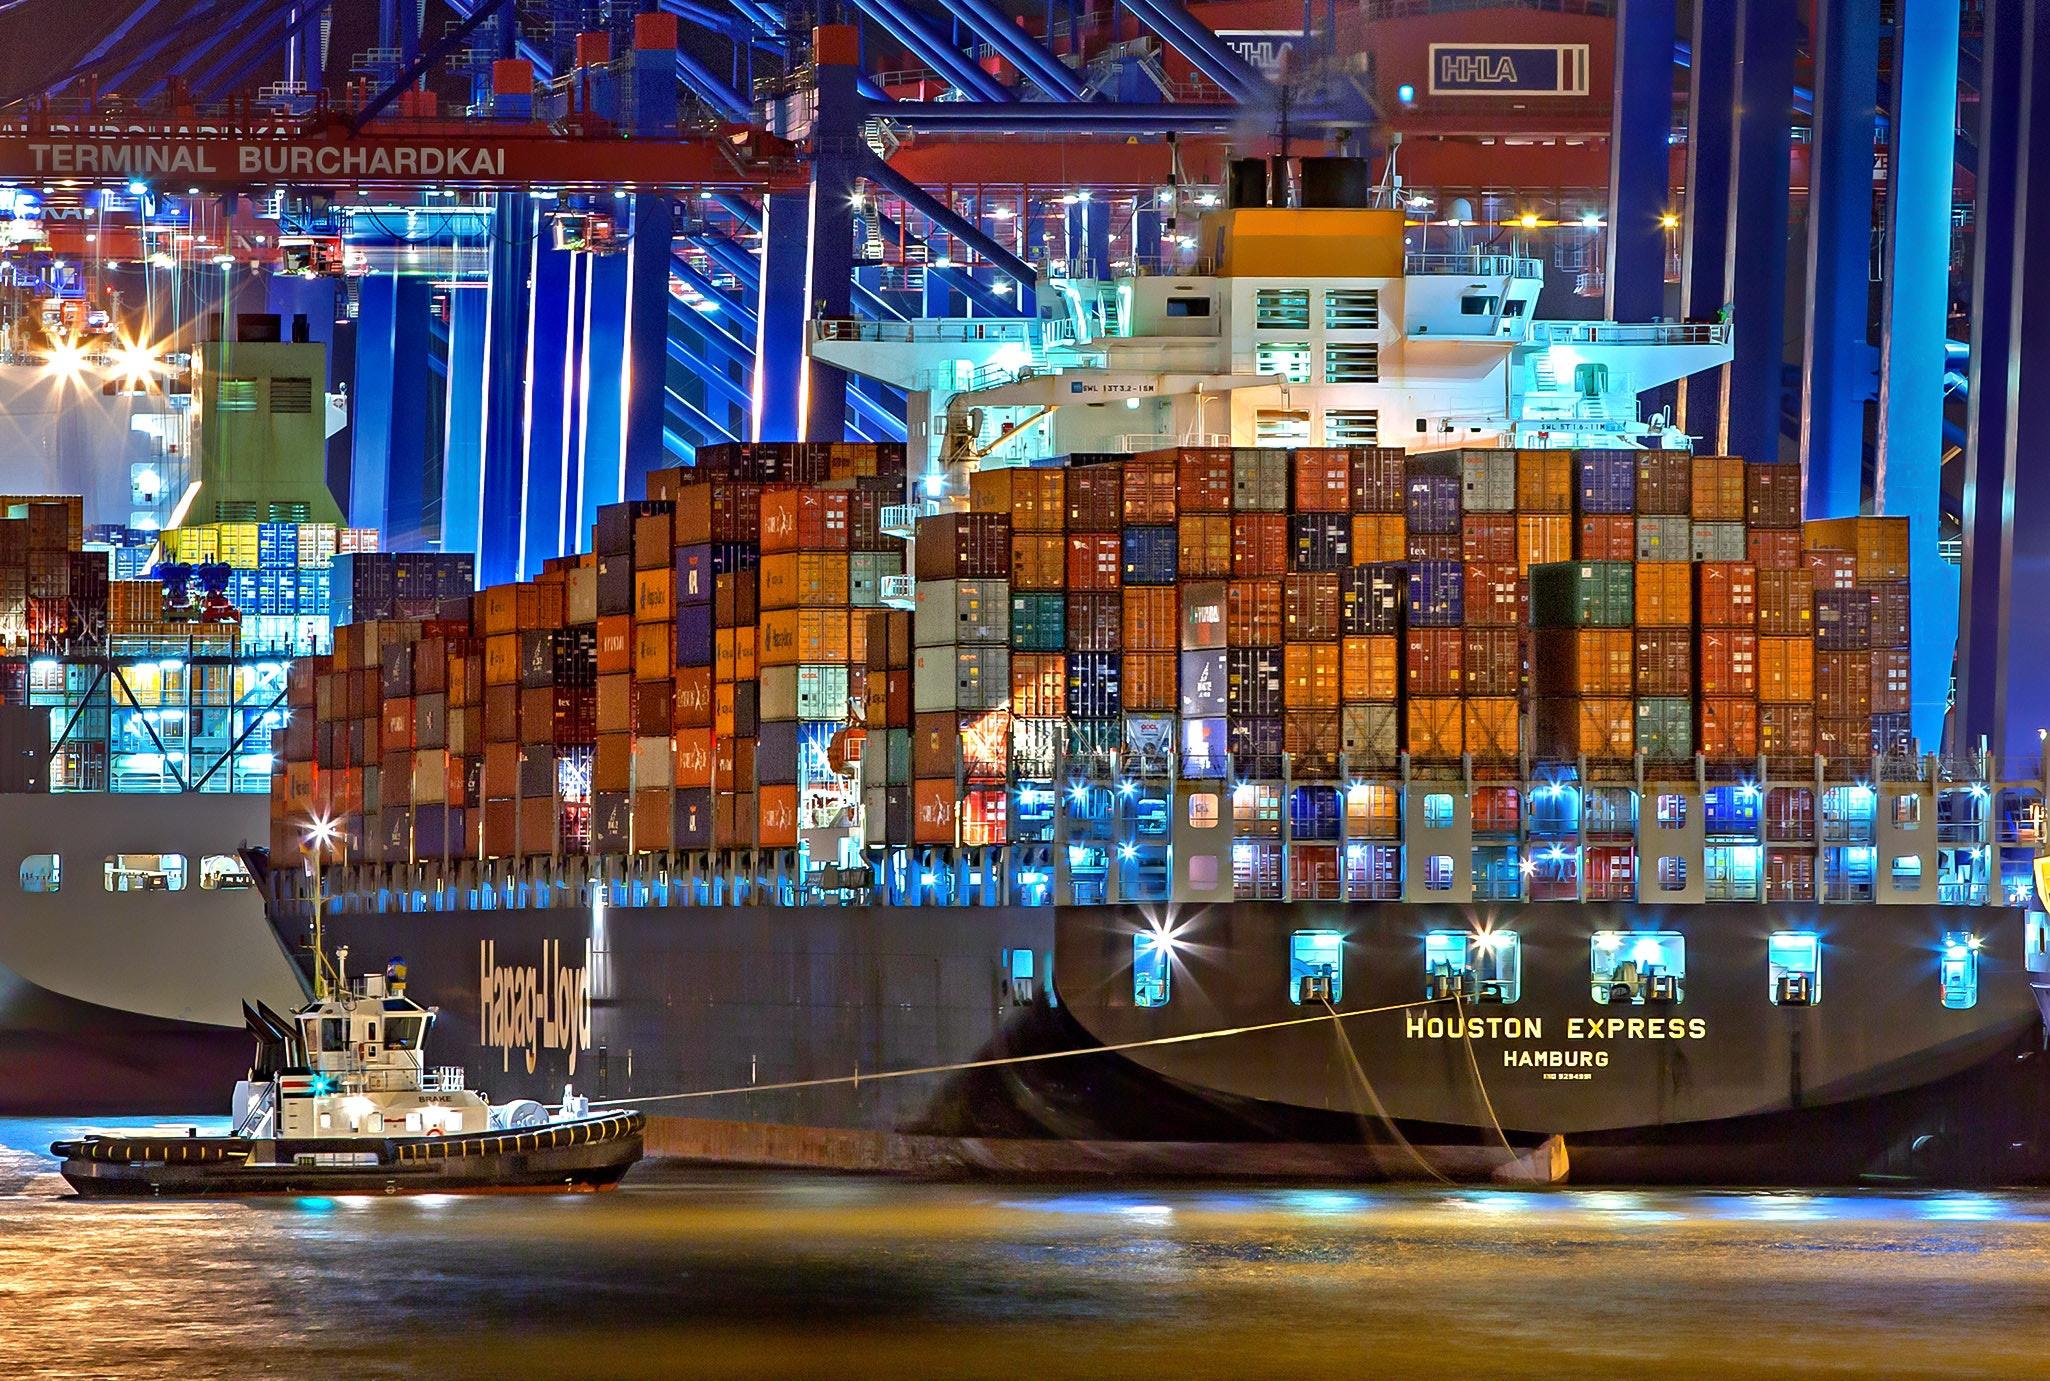 https://0201.nccdn.net/4_2/000/000/019/c2c/boats-cargo-cargo-container-753331-2050x1381.jpg